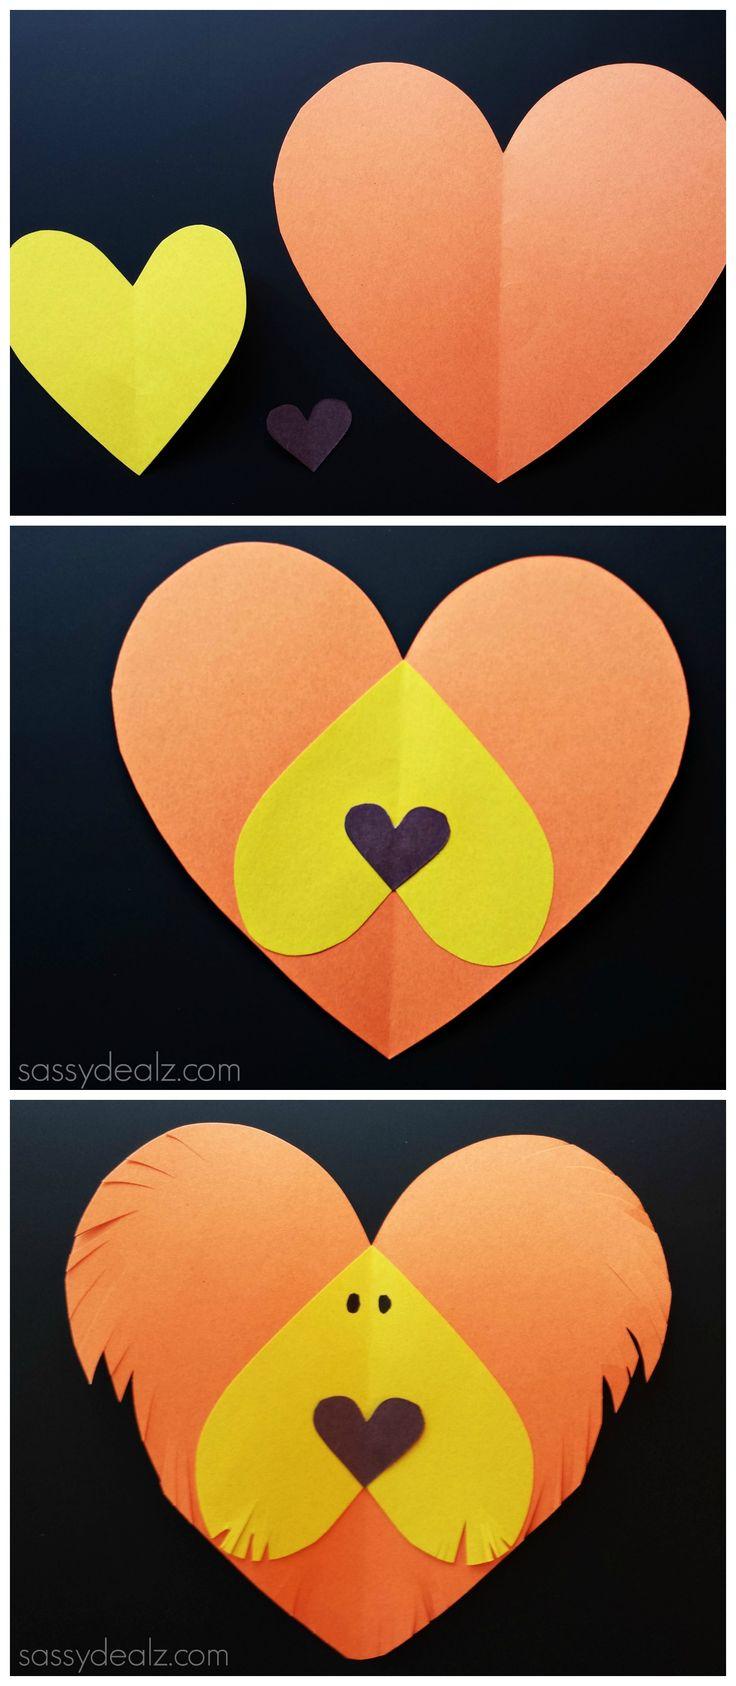 Lion heart craft for kids - Sassydeals com ...